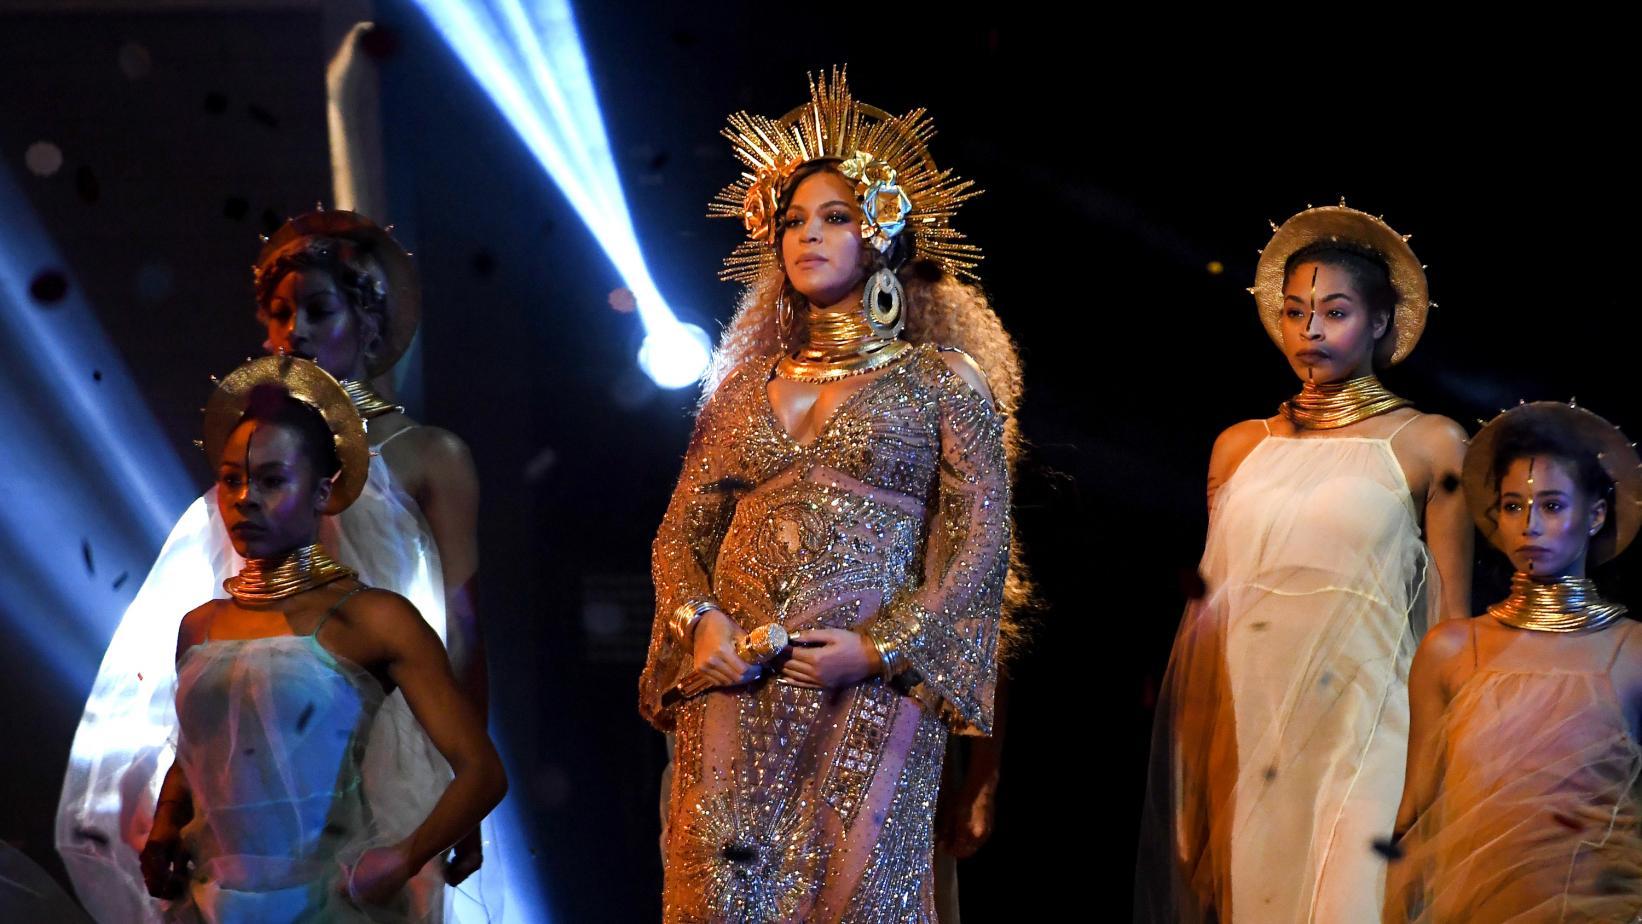 Beyoncé in a look inspired by the Yoruba goddes Oshun.